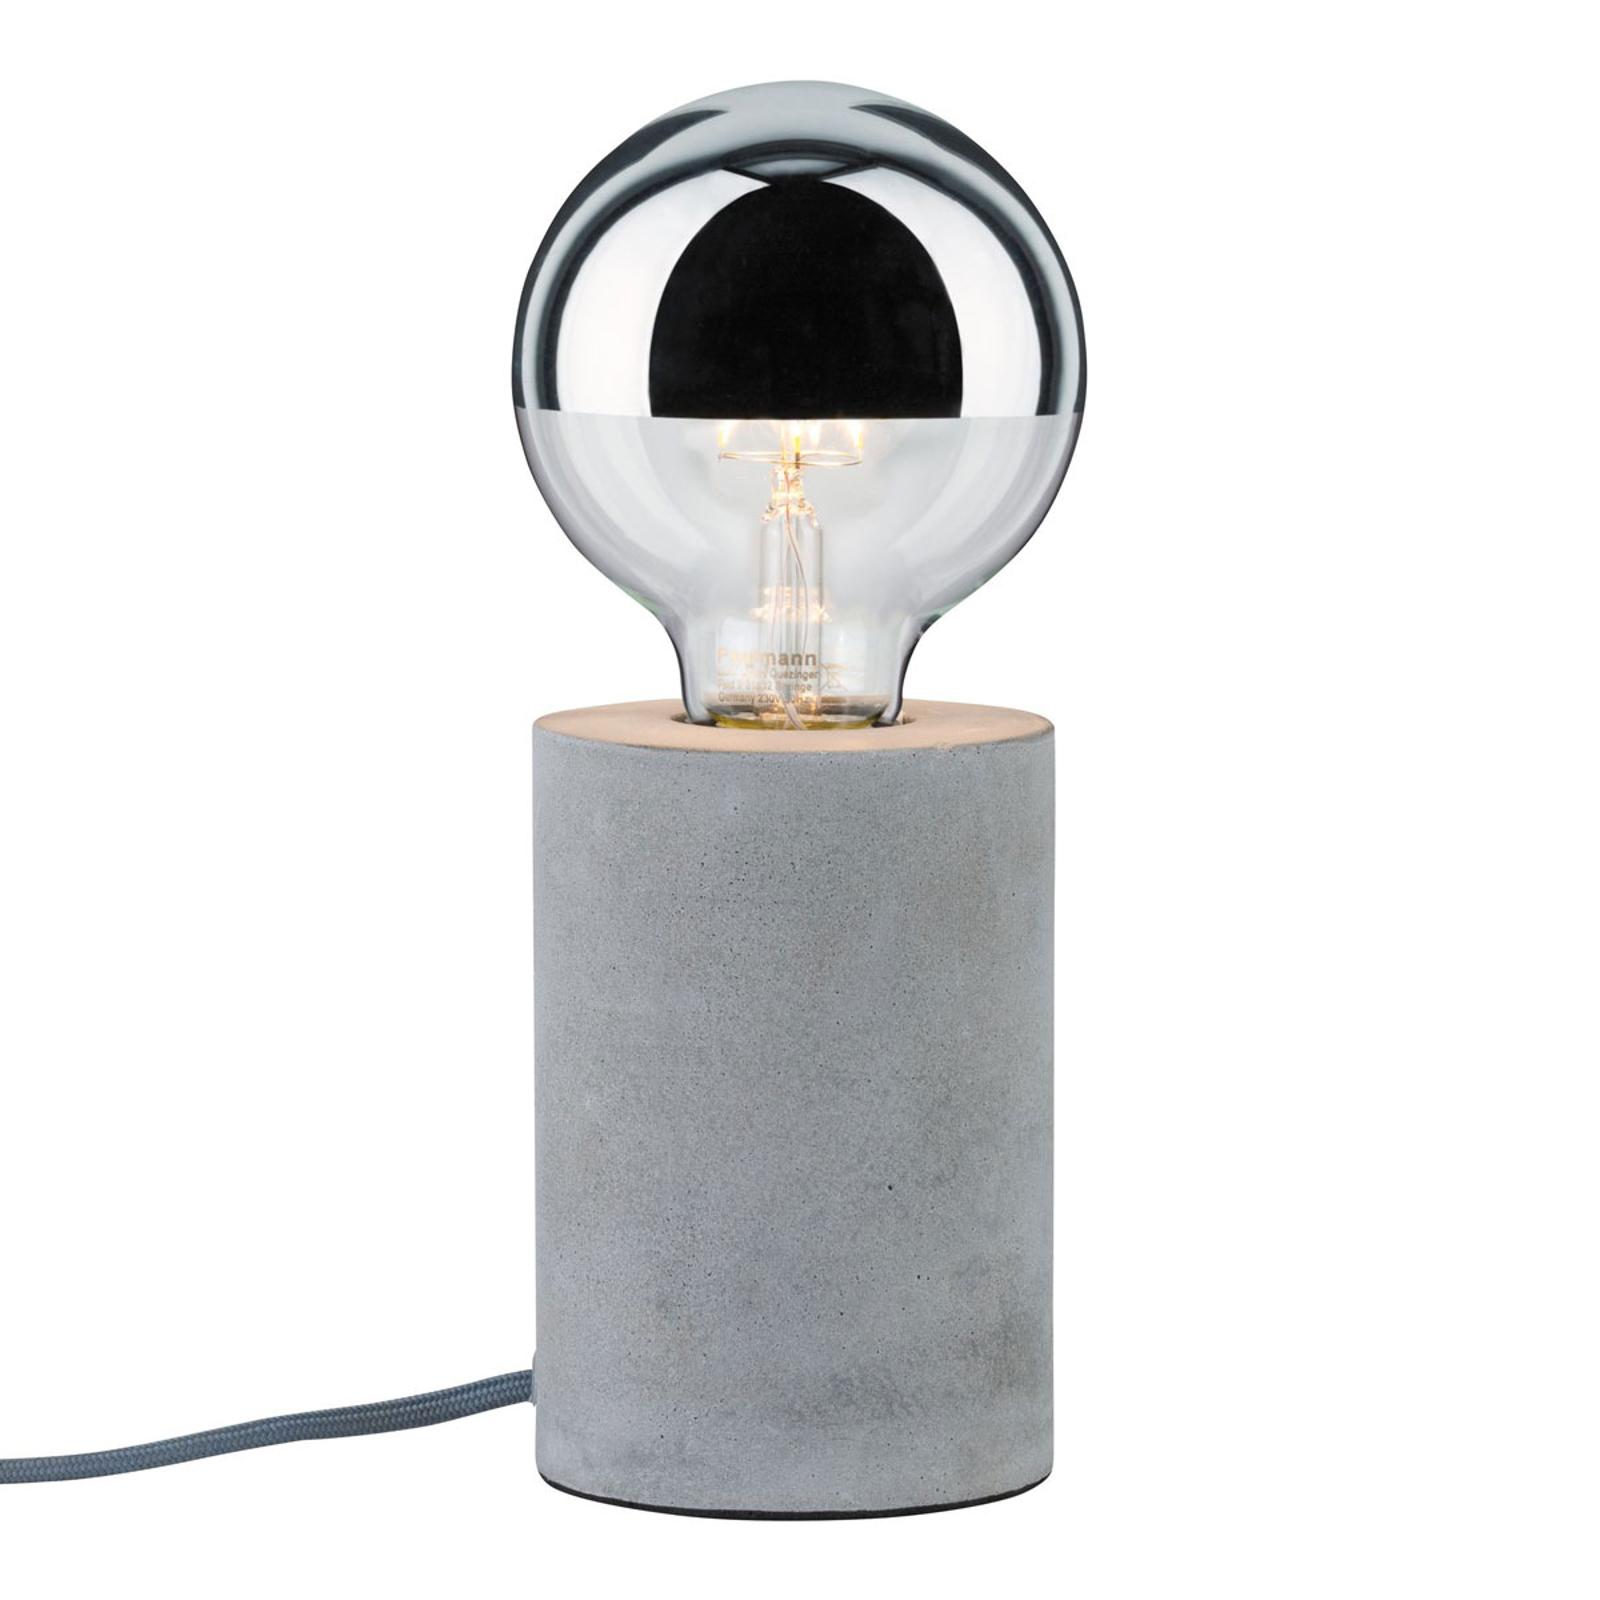 Paulmann Mik tafellamp van beton